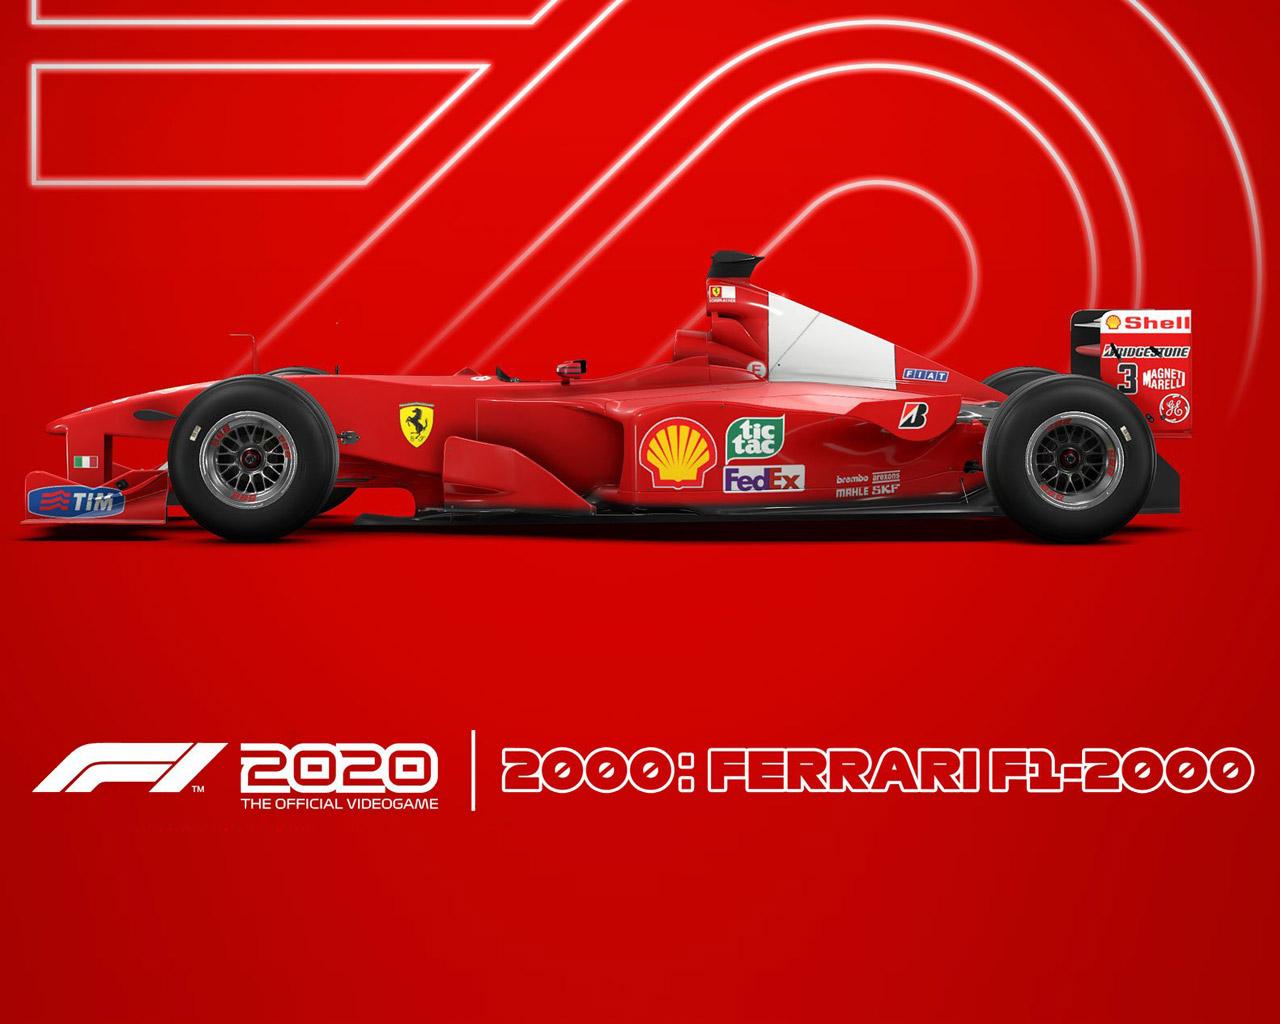 F1 2020 Wallpaper in 1280x1024